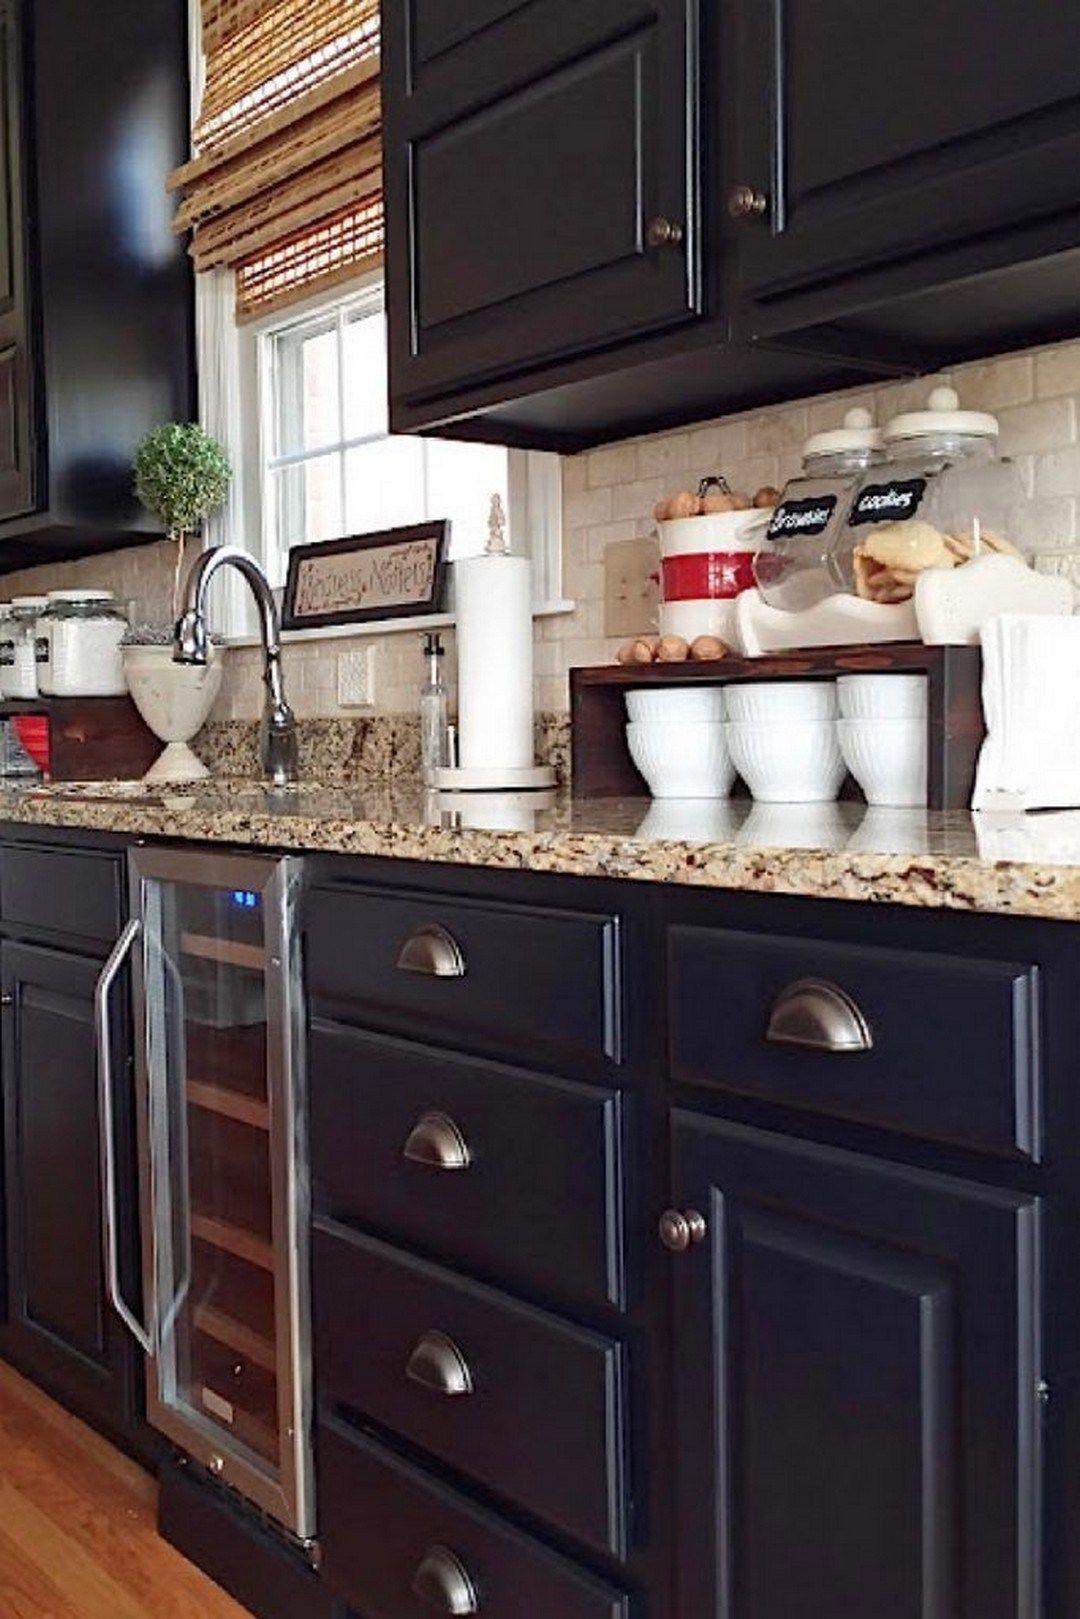 39 Sensational Black Kitchens Cabinets To Inspire (9 ...